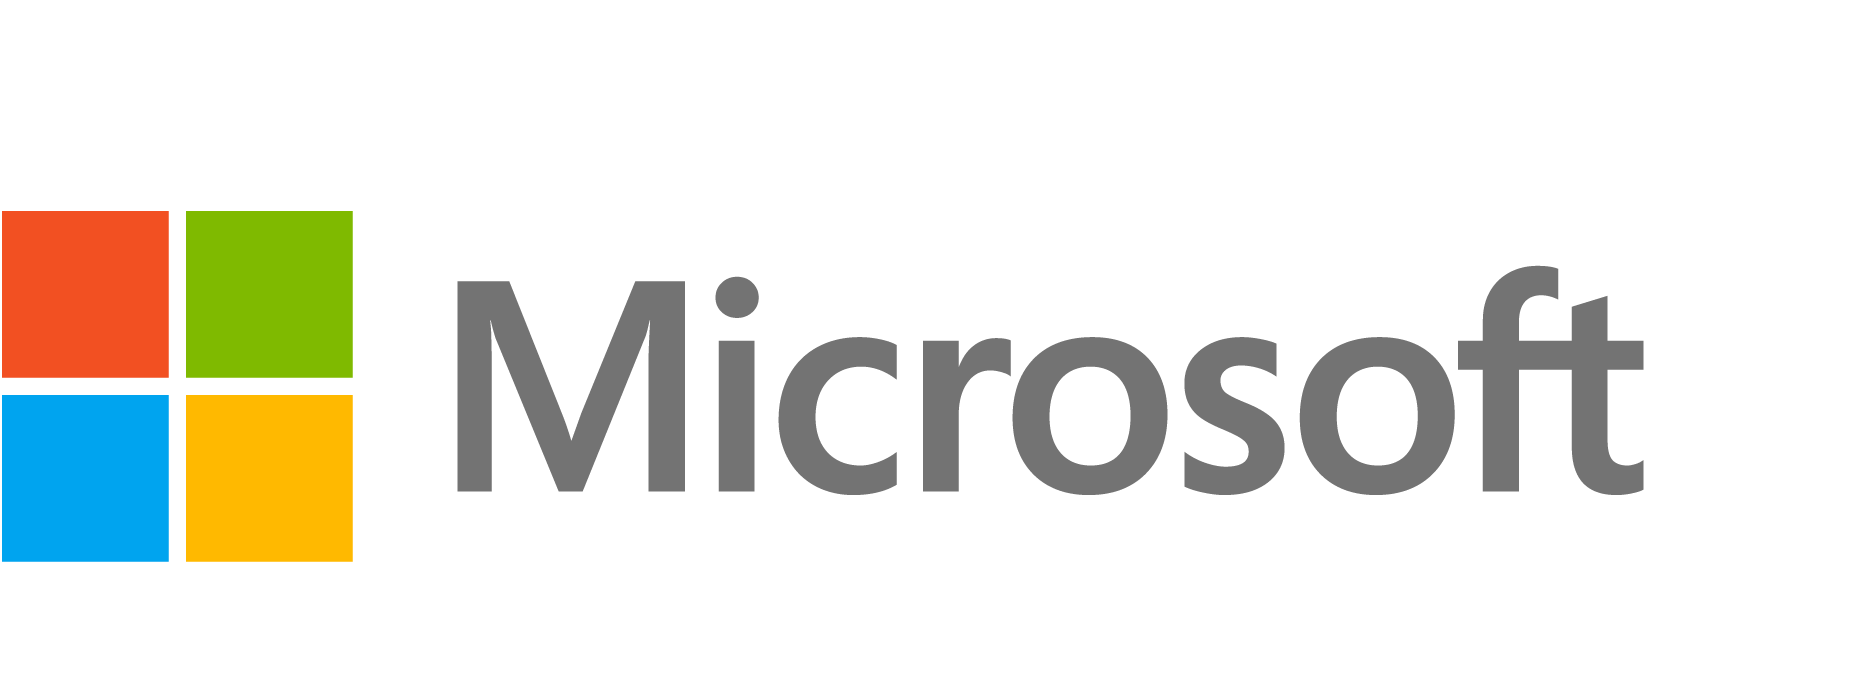 Microsoft-Logo-PNG